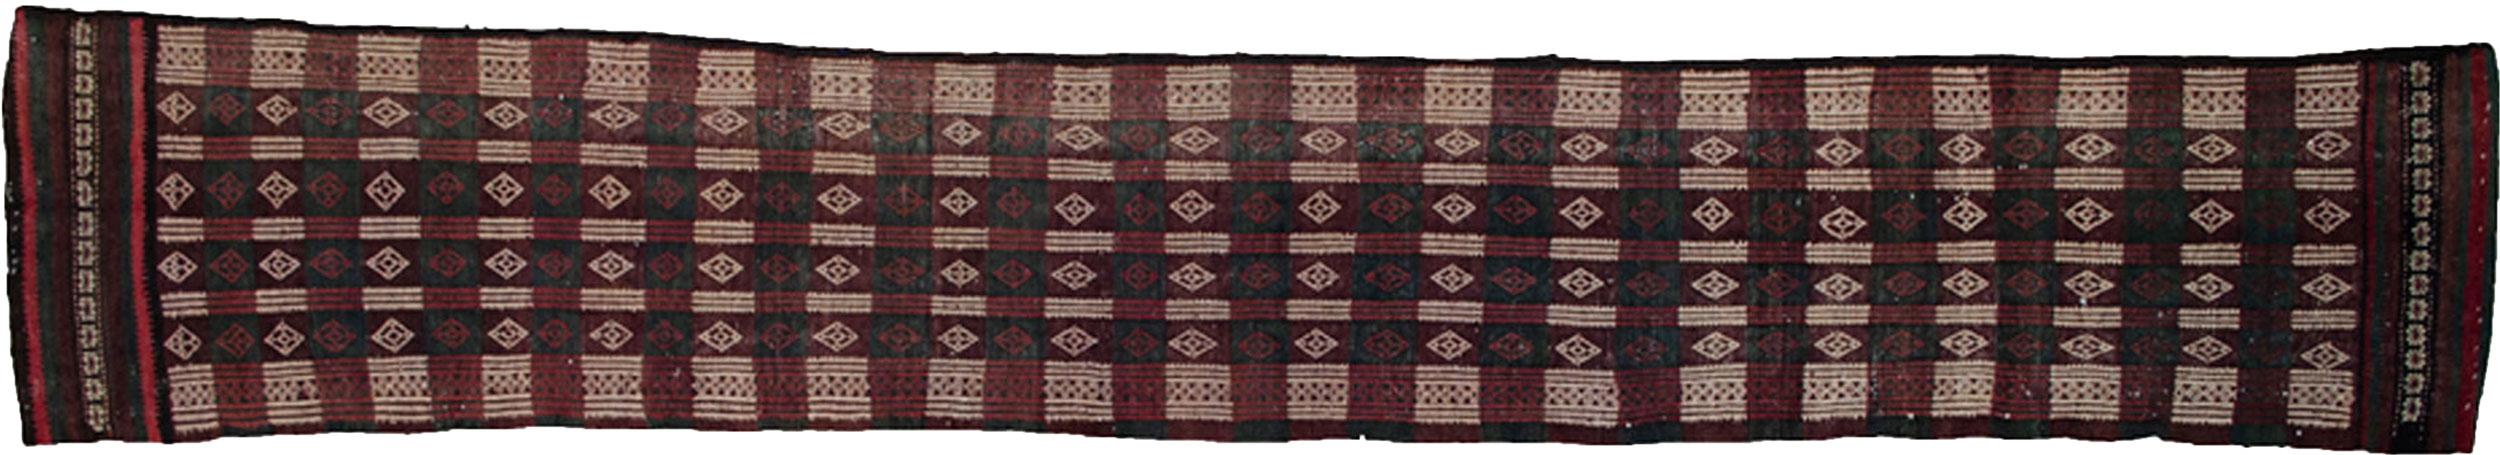 Antique Baluch Tentband 270x40cm